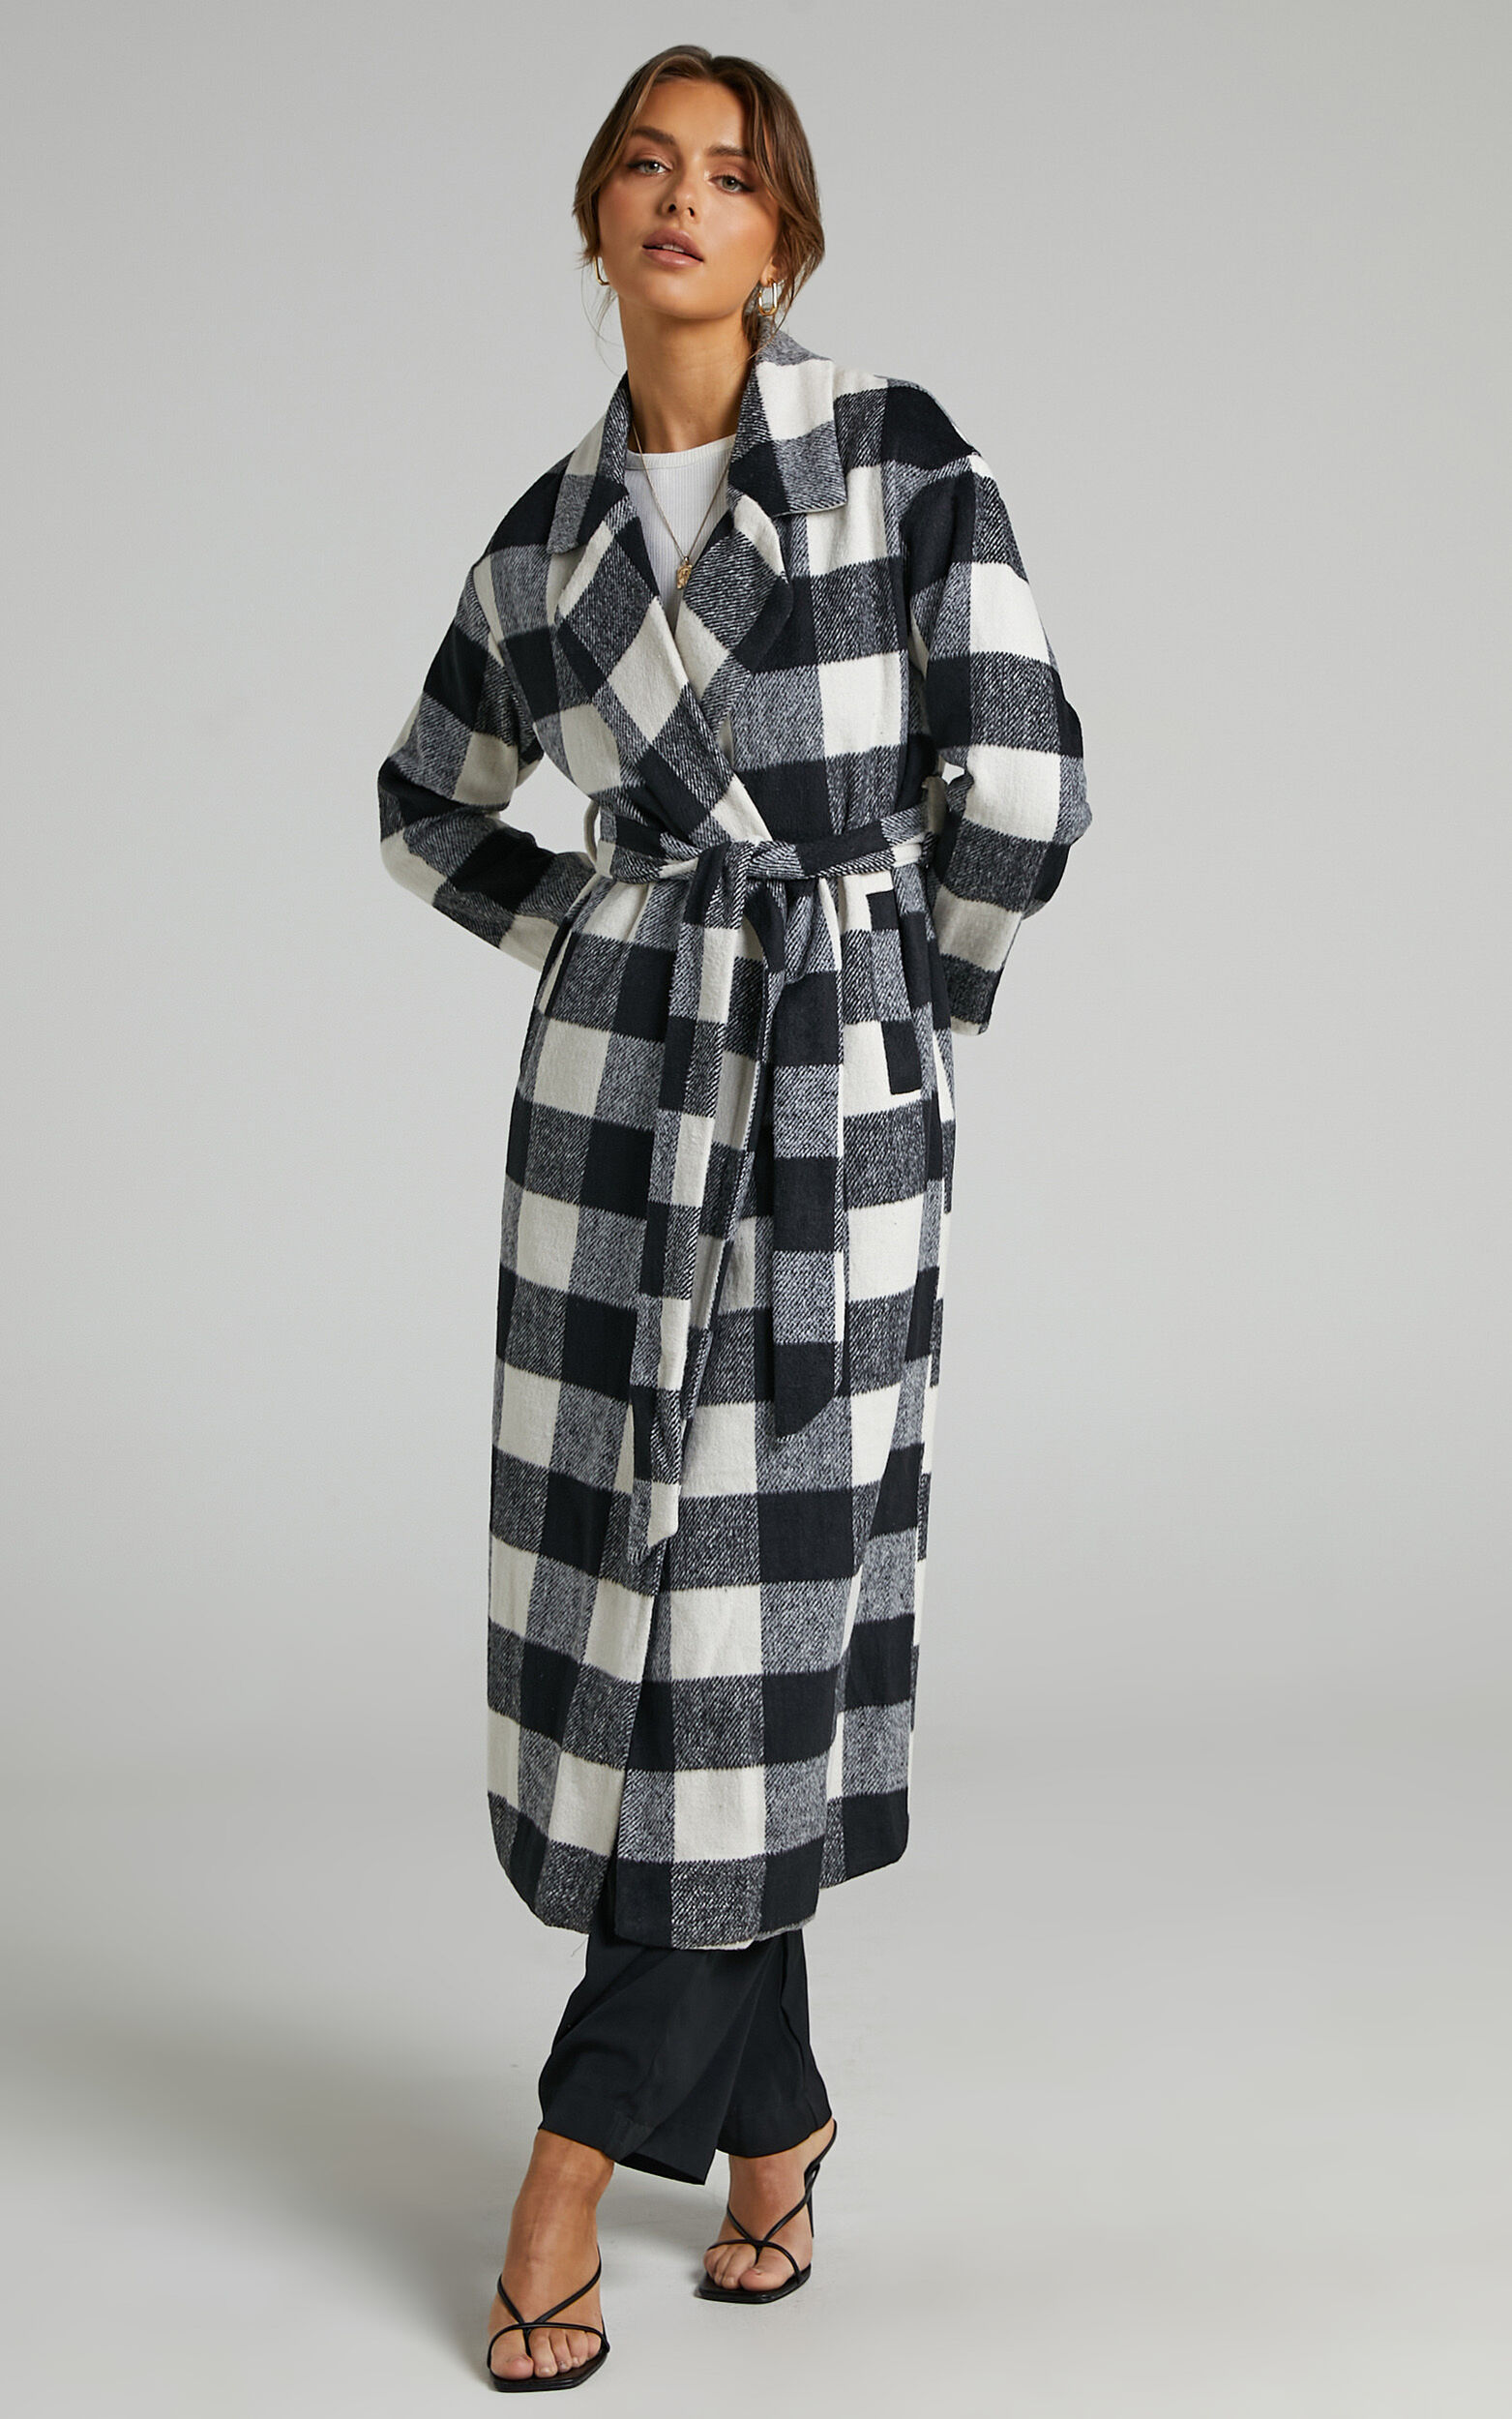 Vancouver Longline Tie Front Coat in Black Check - 06, BLK1, super-hi-res image number null